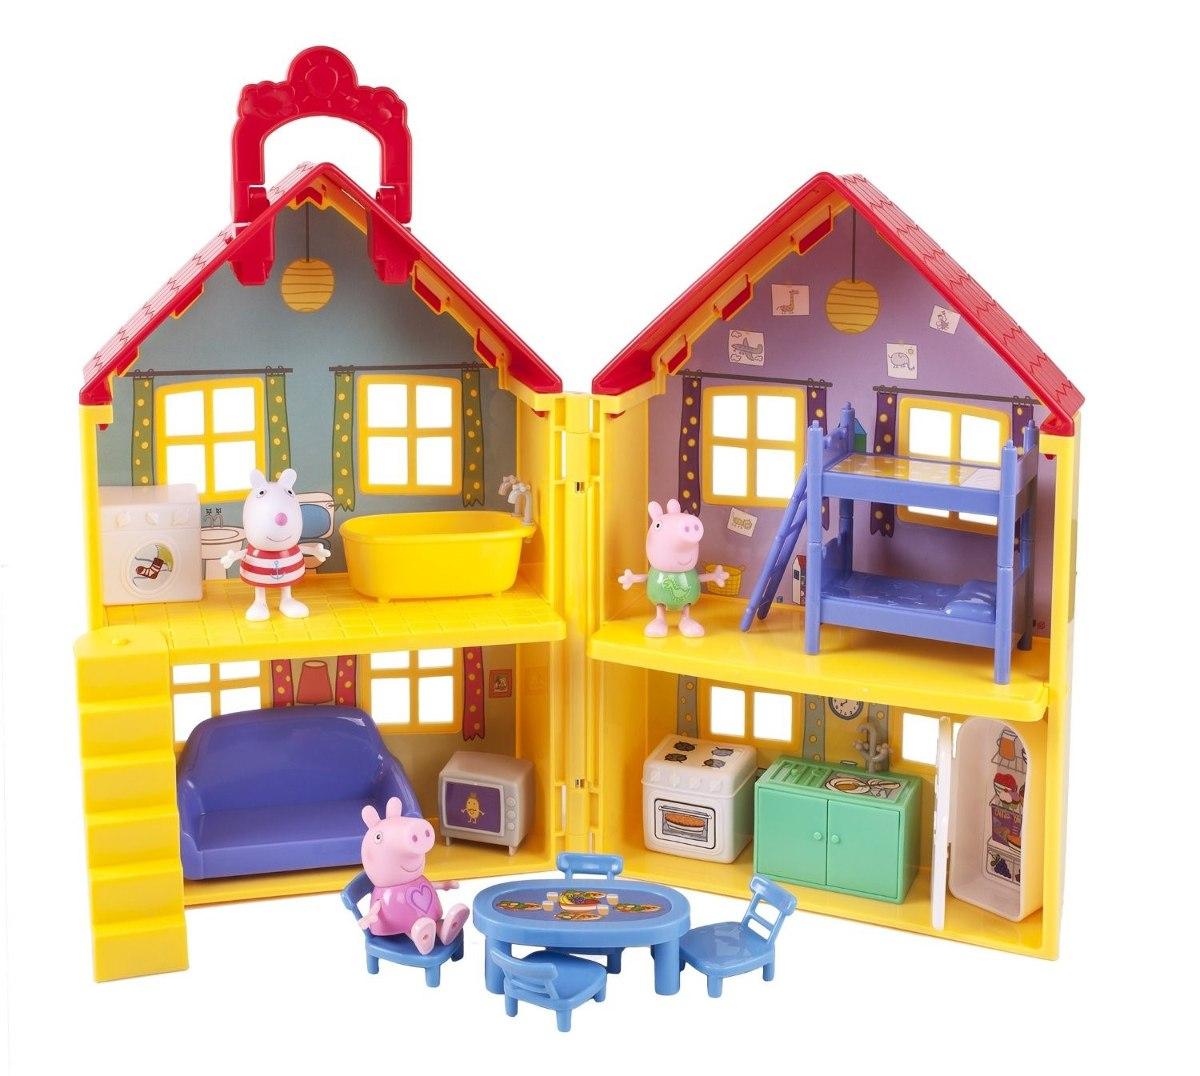 Casa casita de juego peppa pig 15 accesorios importada nick 1 en mercado libre - Accesorios para casa ...